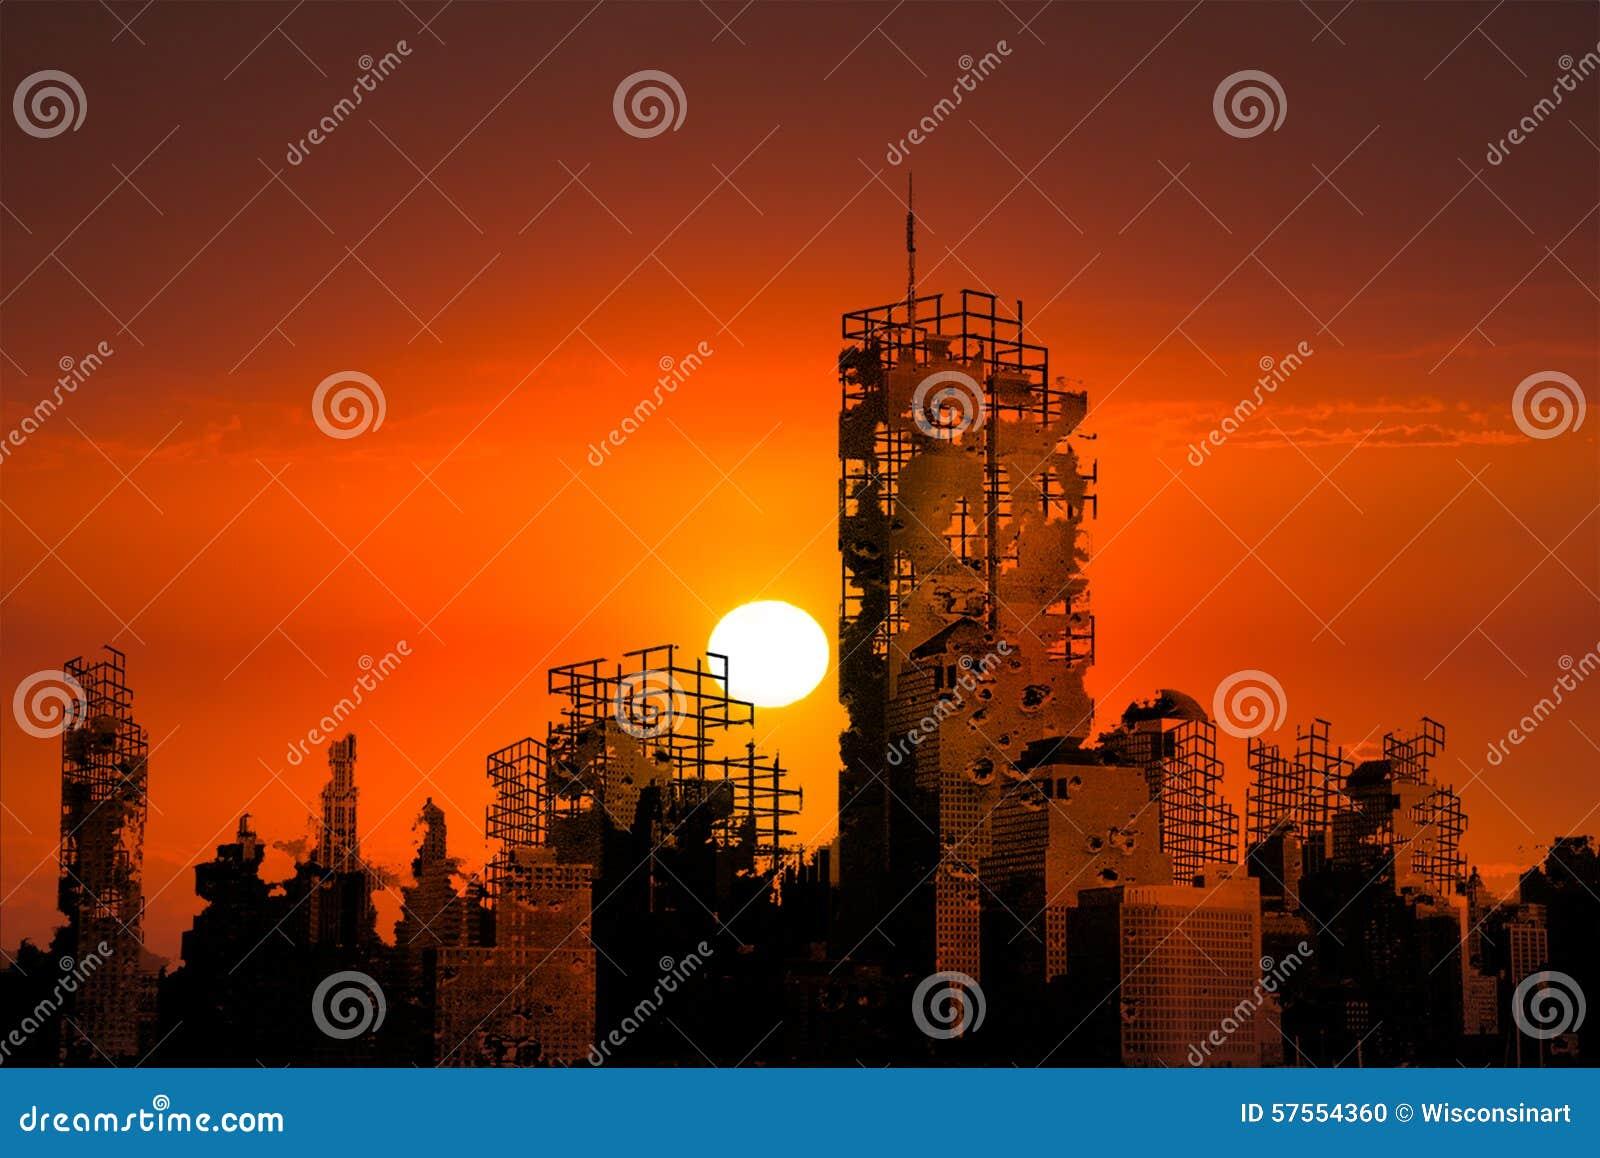 apocalypse city ruins sunset background